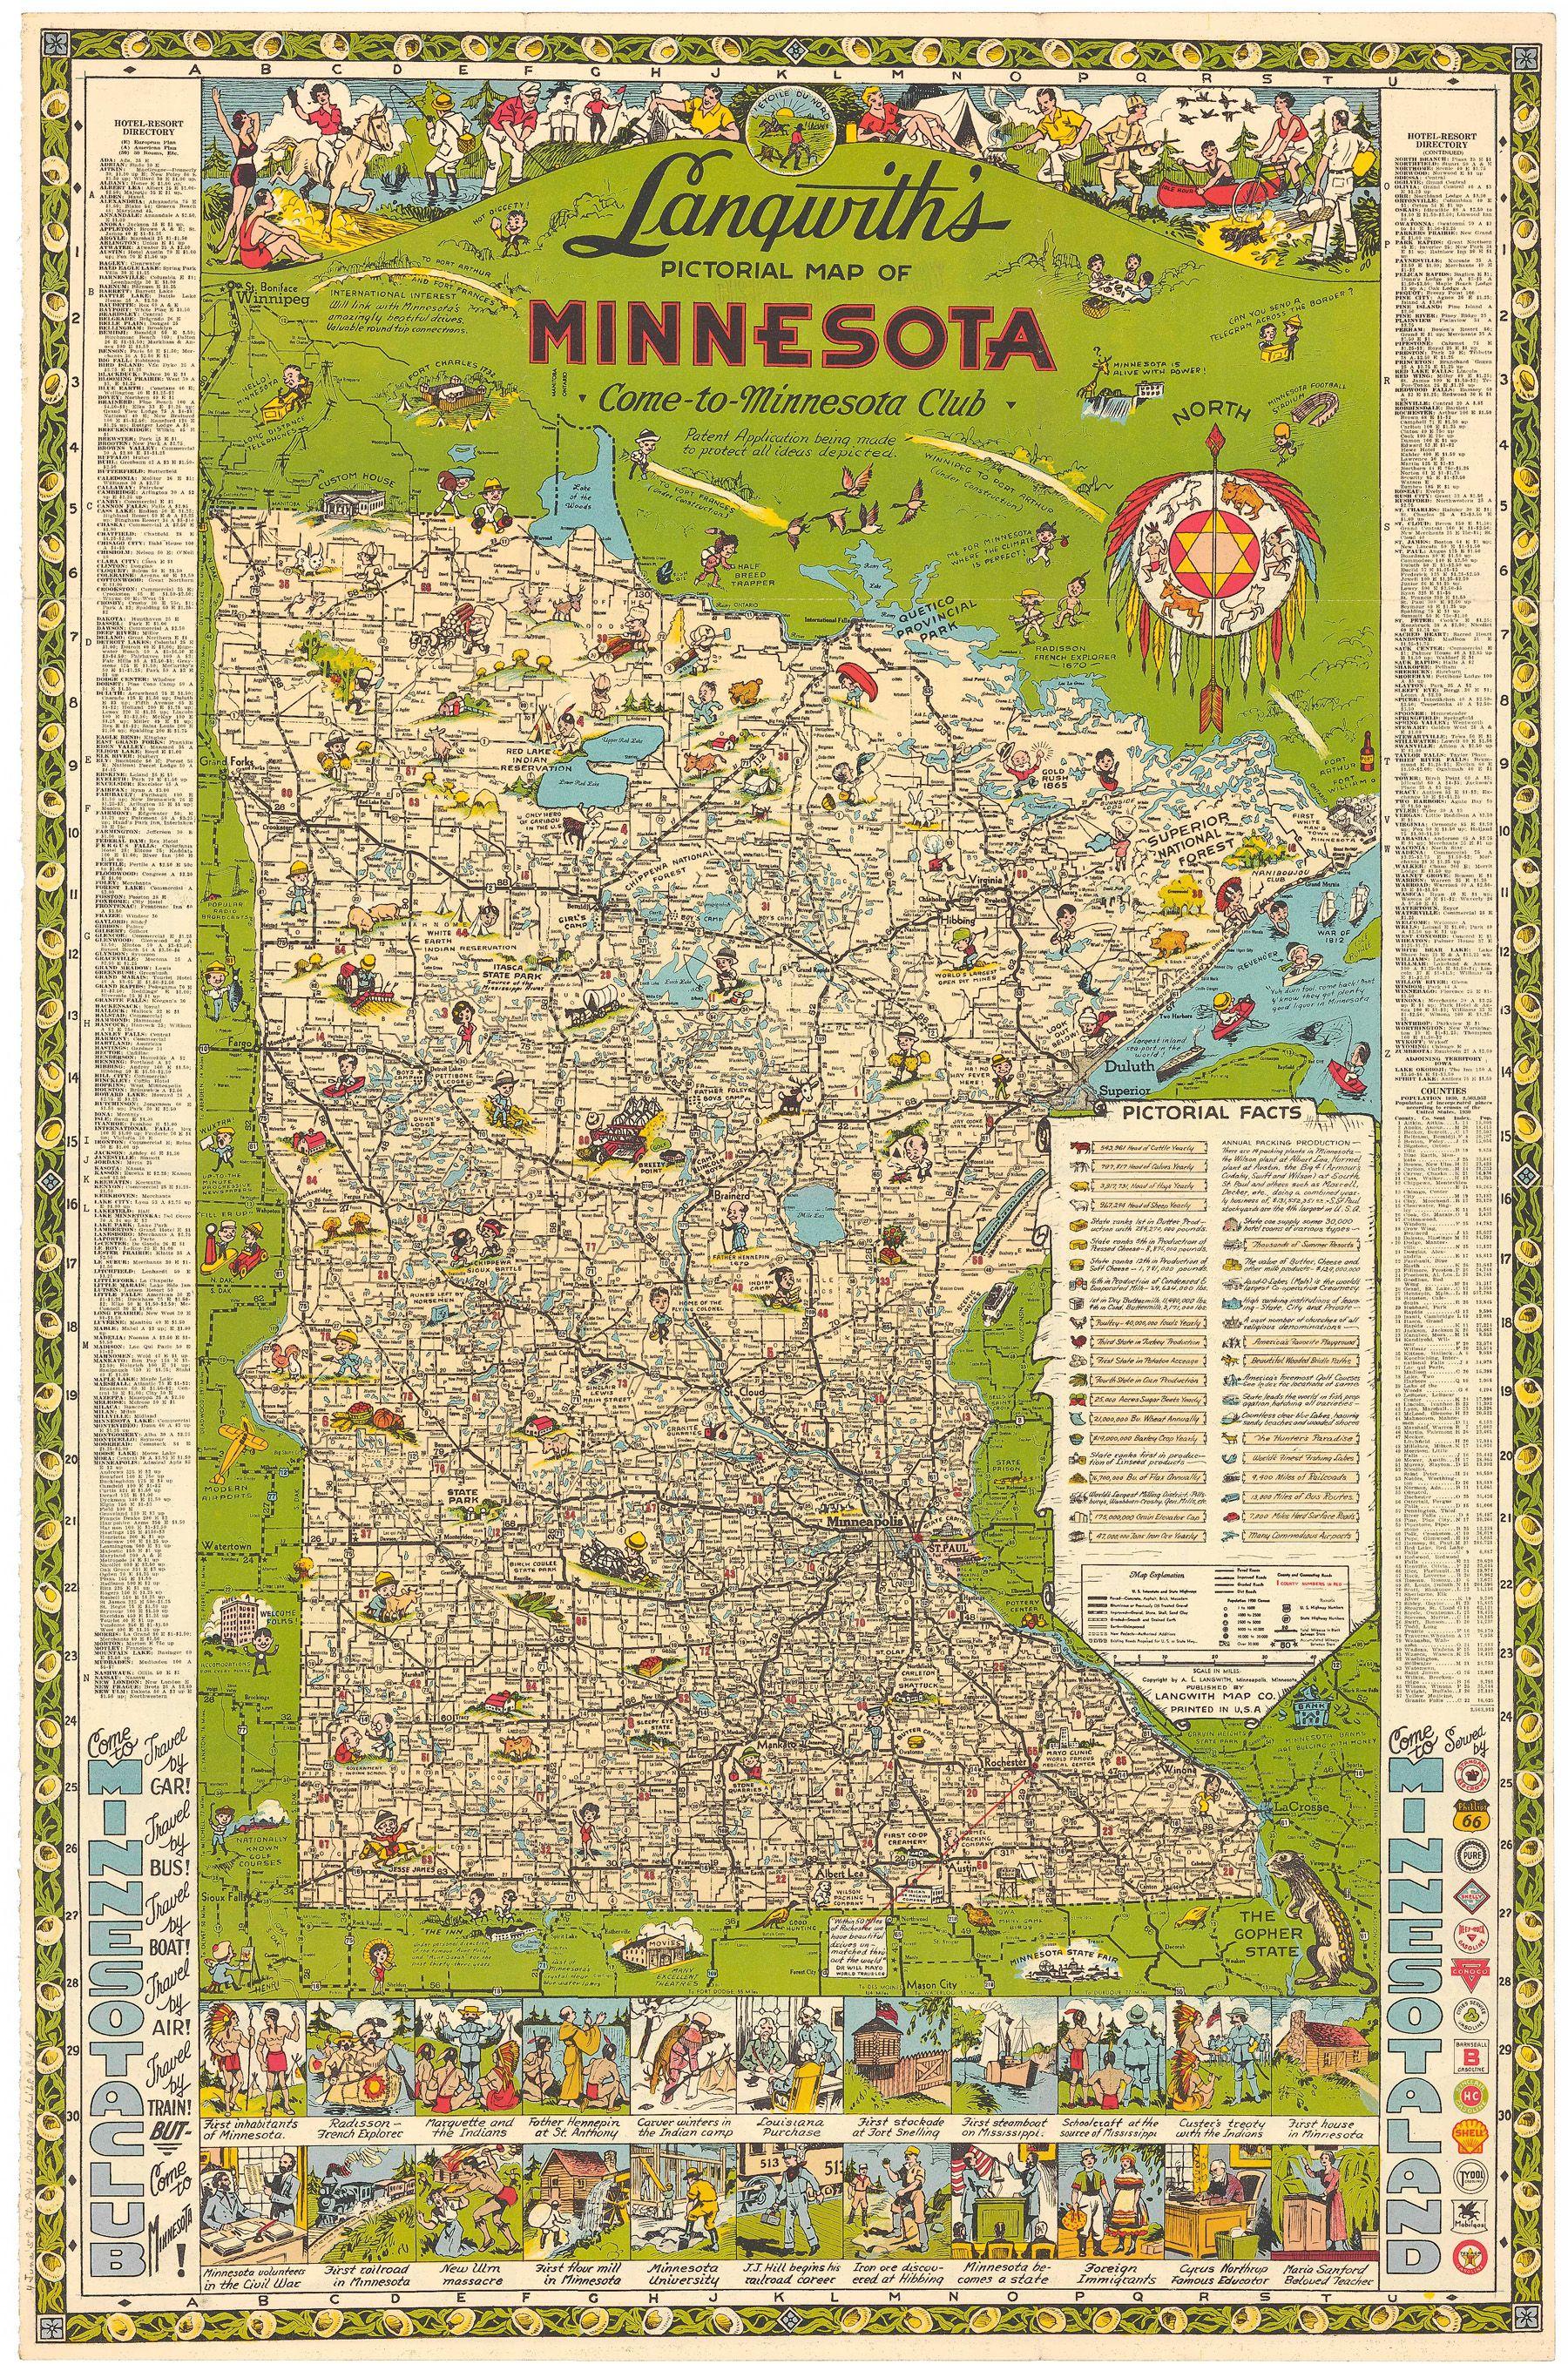 Pin by Cody Carolyn on Minnesota | Minnesota historical ... Umn Maps on usda map, usd map, care map, university of minnesota twin cities map, austin street map, umd map, umt map, uc map, university of minnesota parking map, ucdavis map, umc map, und map, umo map, u of m twin cities map, university of minnesota west bank map, upj map, university of minnesota minneapolis map, u of m campus map, minnesota campus map, um map,